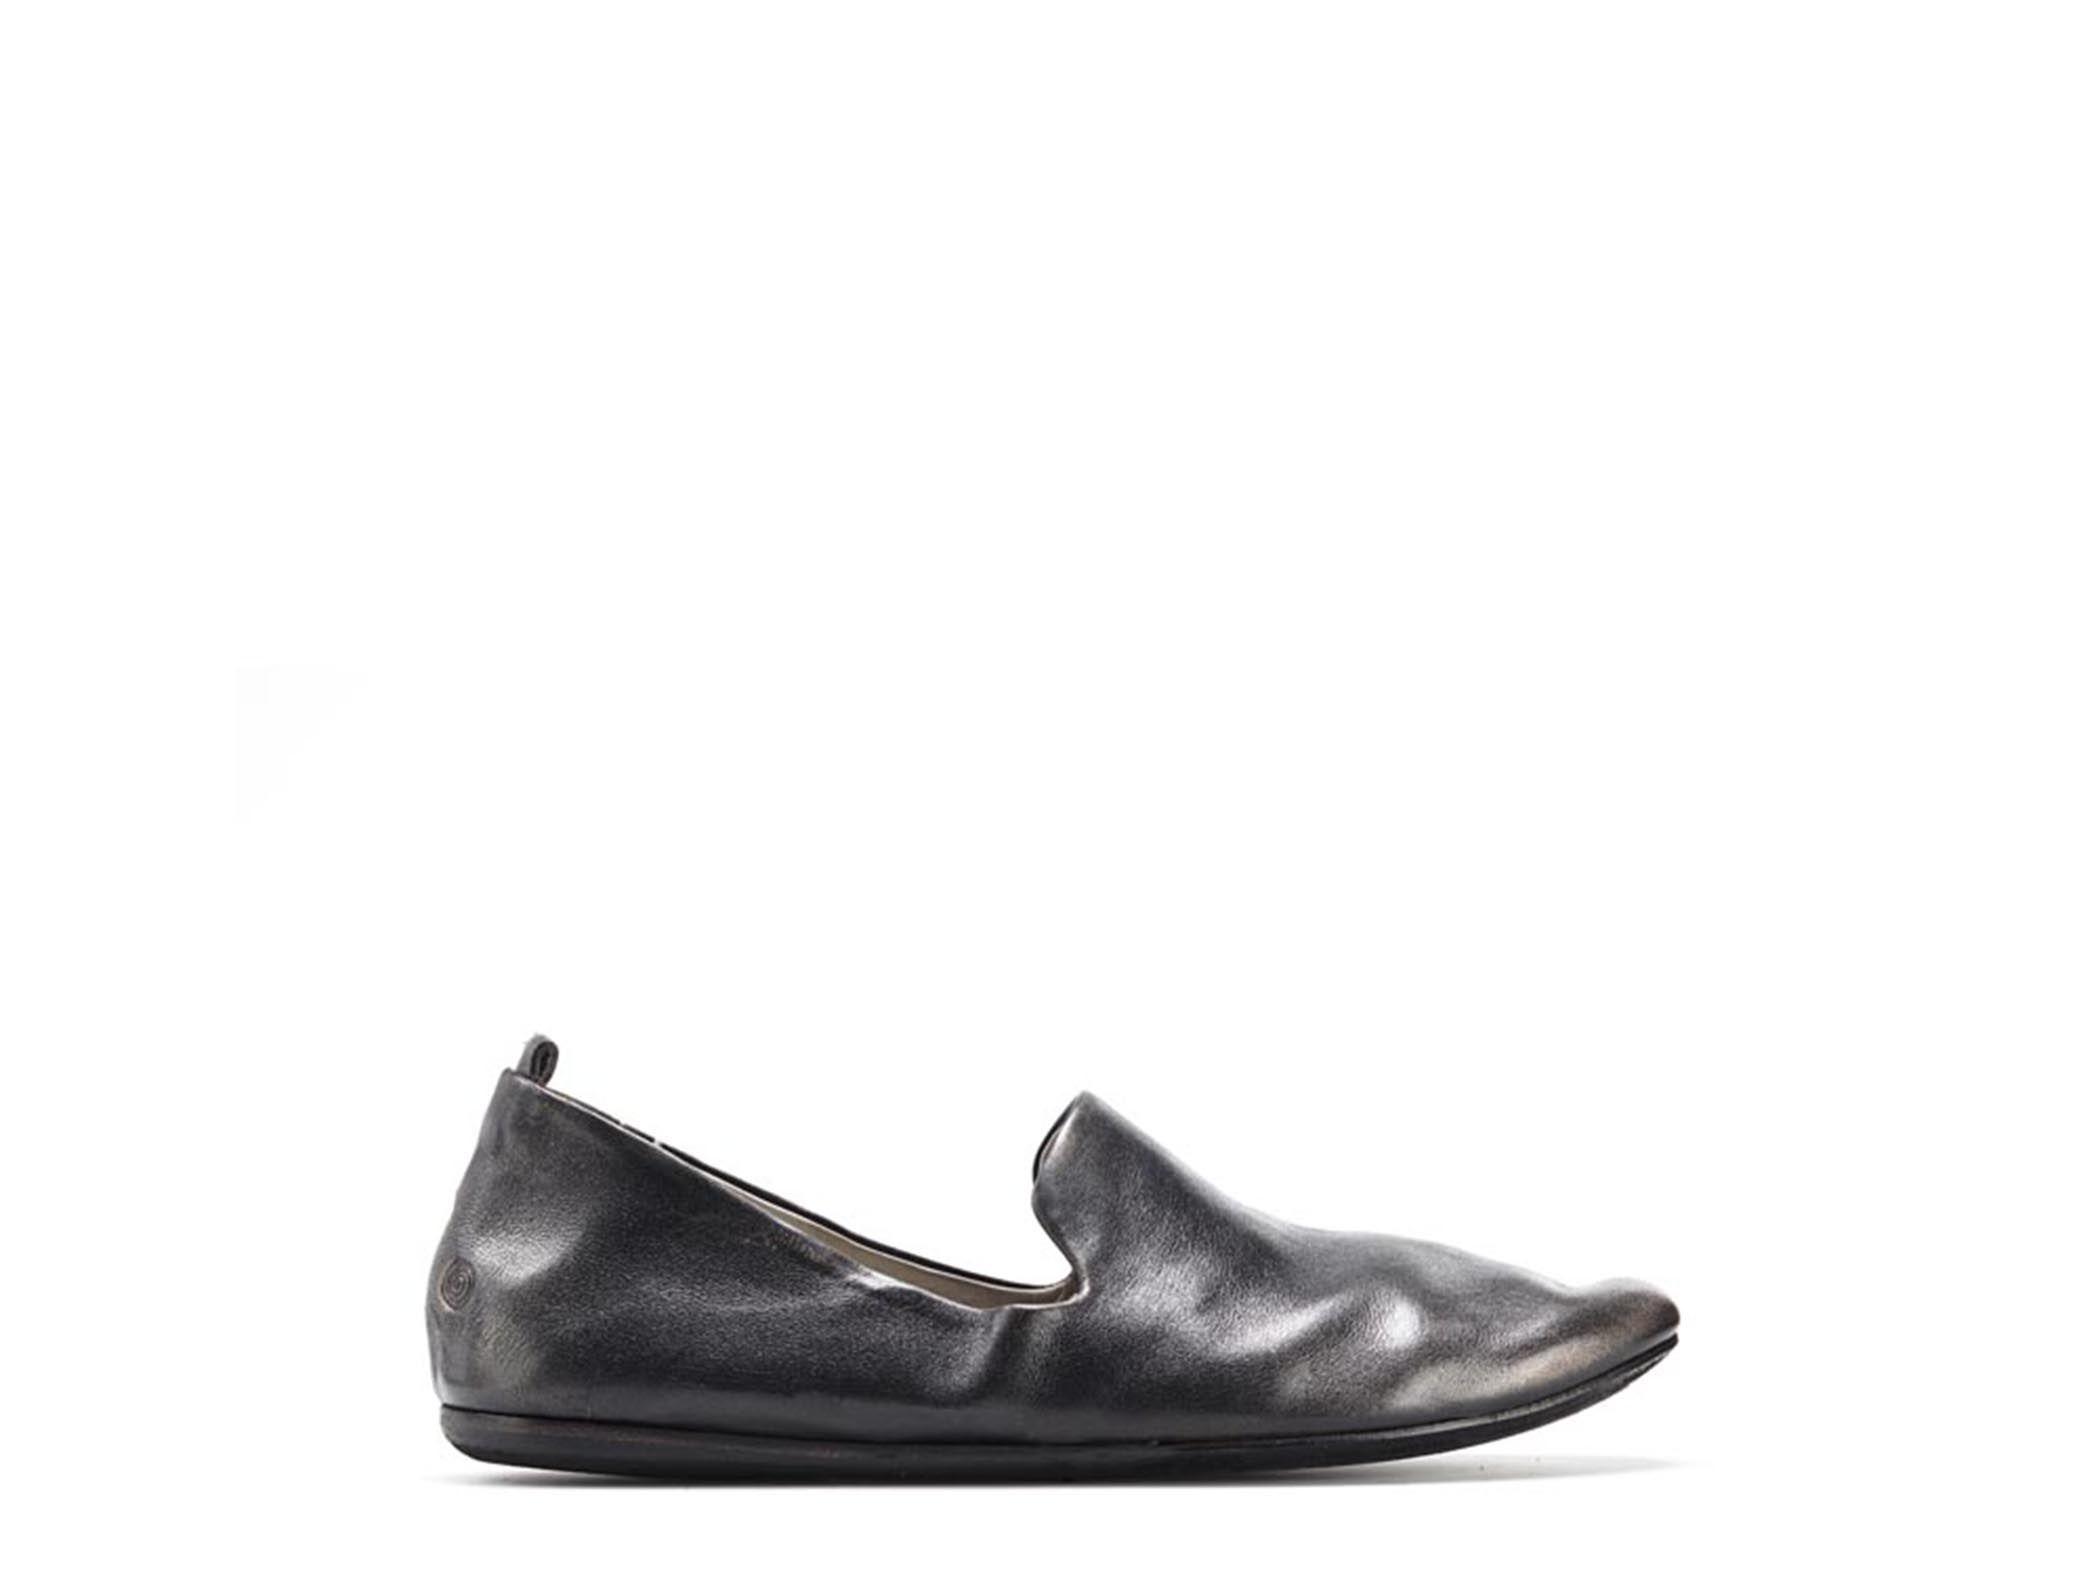 Marsell Shoes & Handbags for Intro 2015 #Marsell #marsellshoes #marsellhandbags